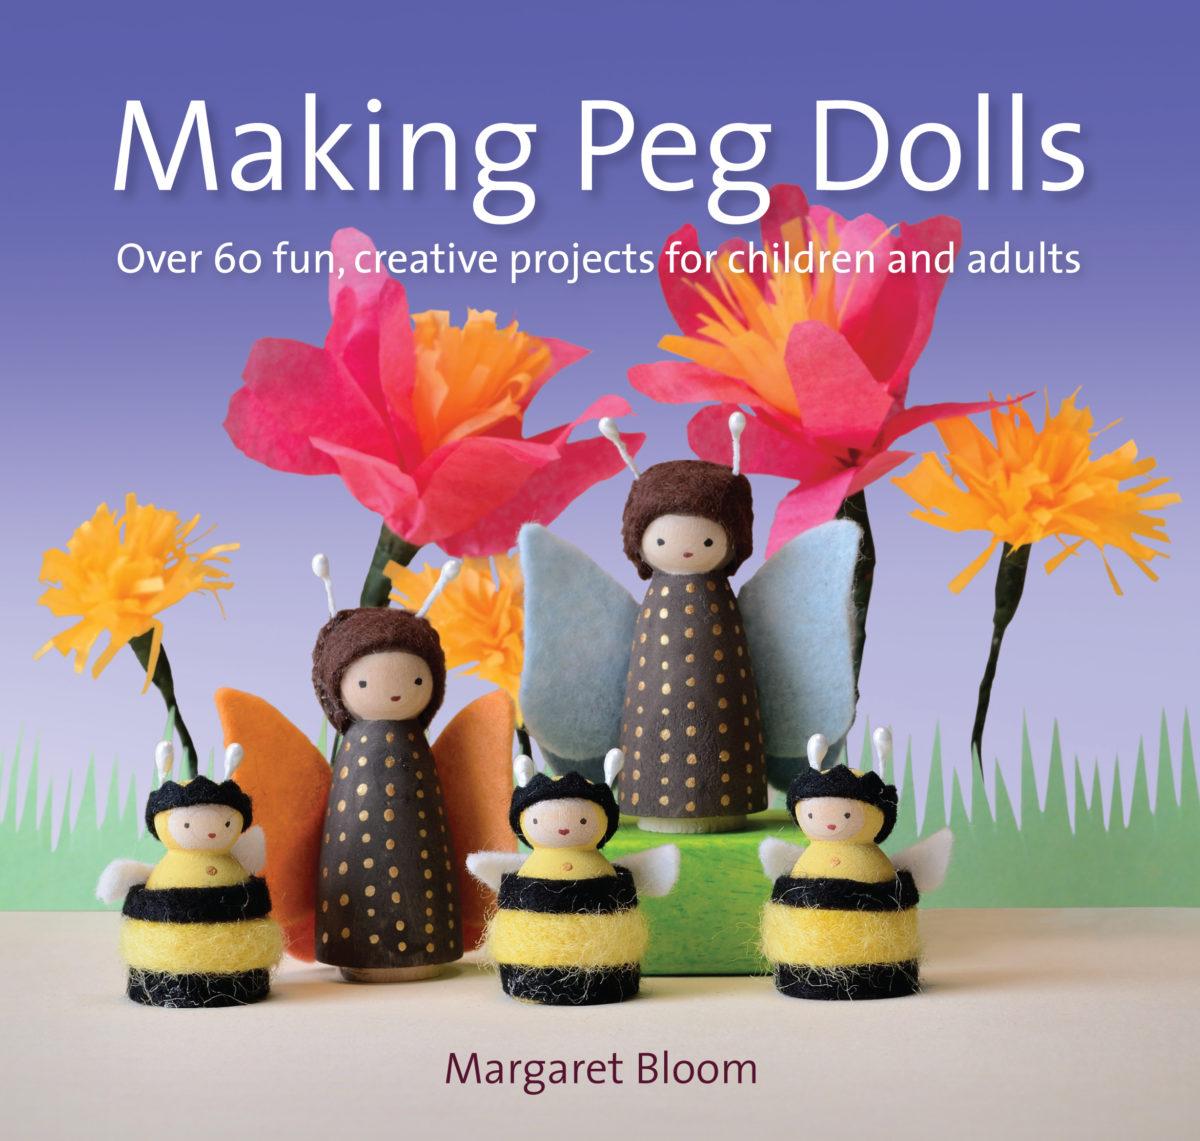 Making Peg Dolls cover paperback